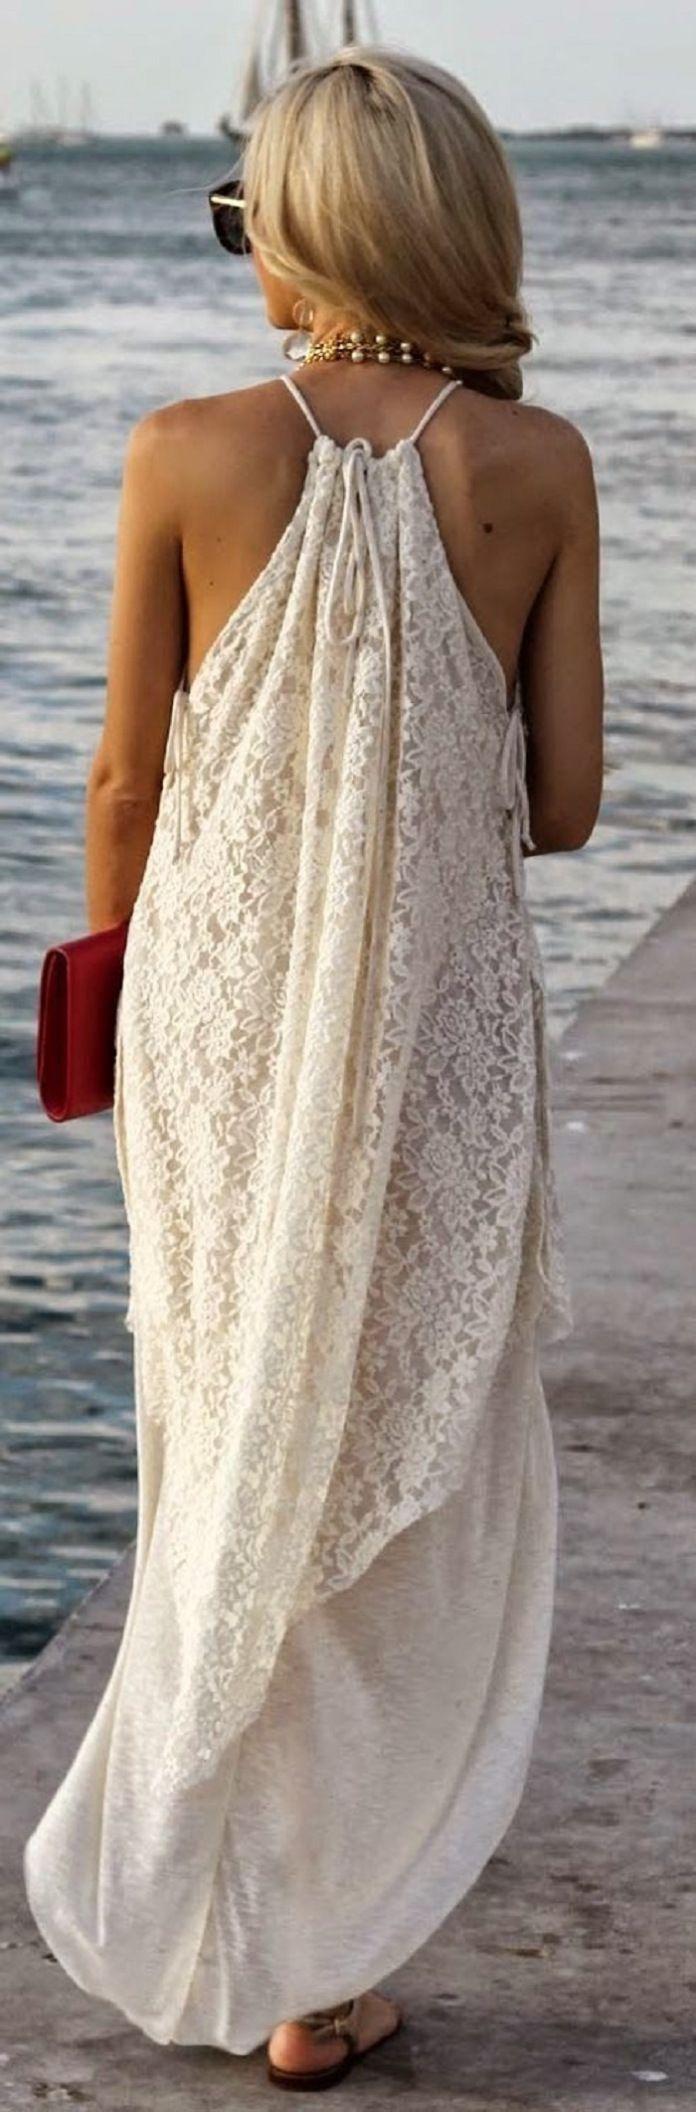 Thin strap lacy long maxi dress womenus fashion that i love